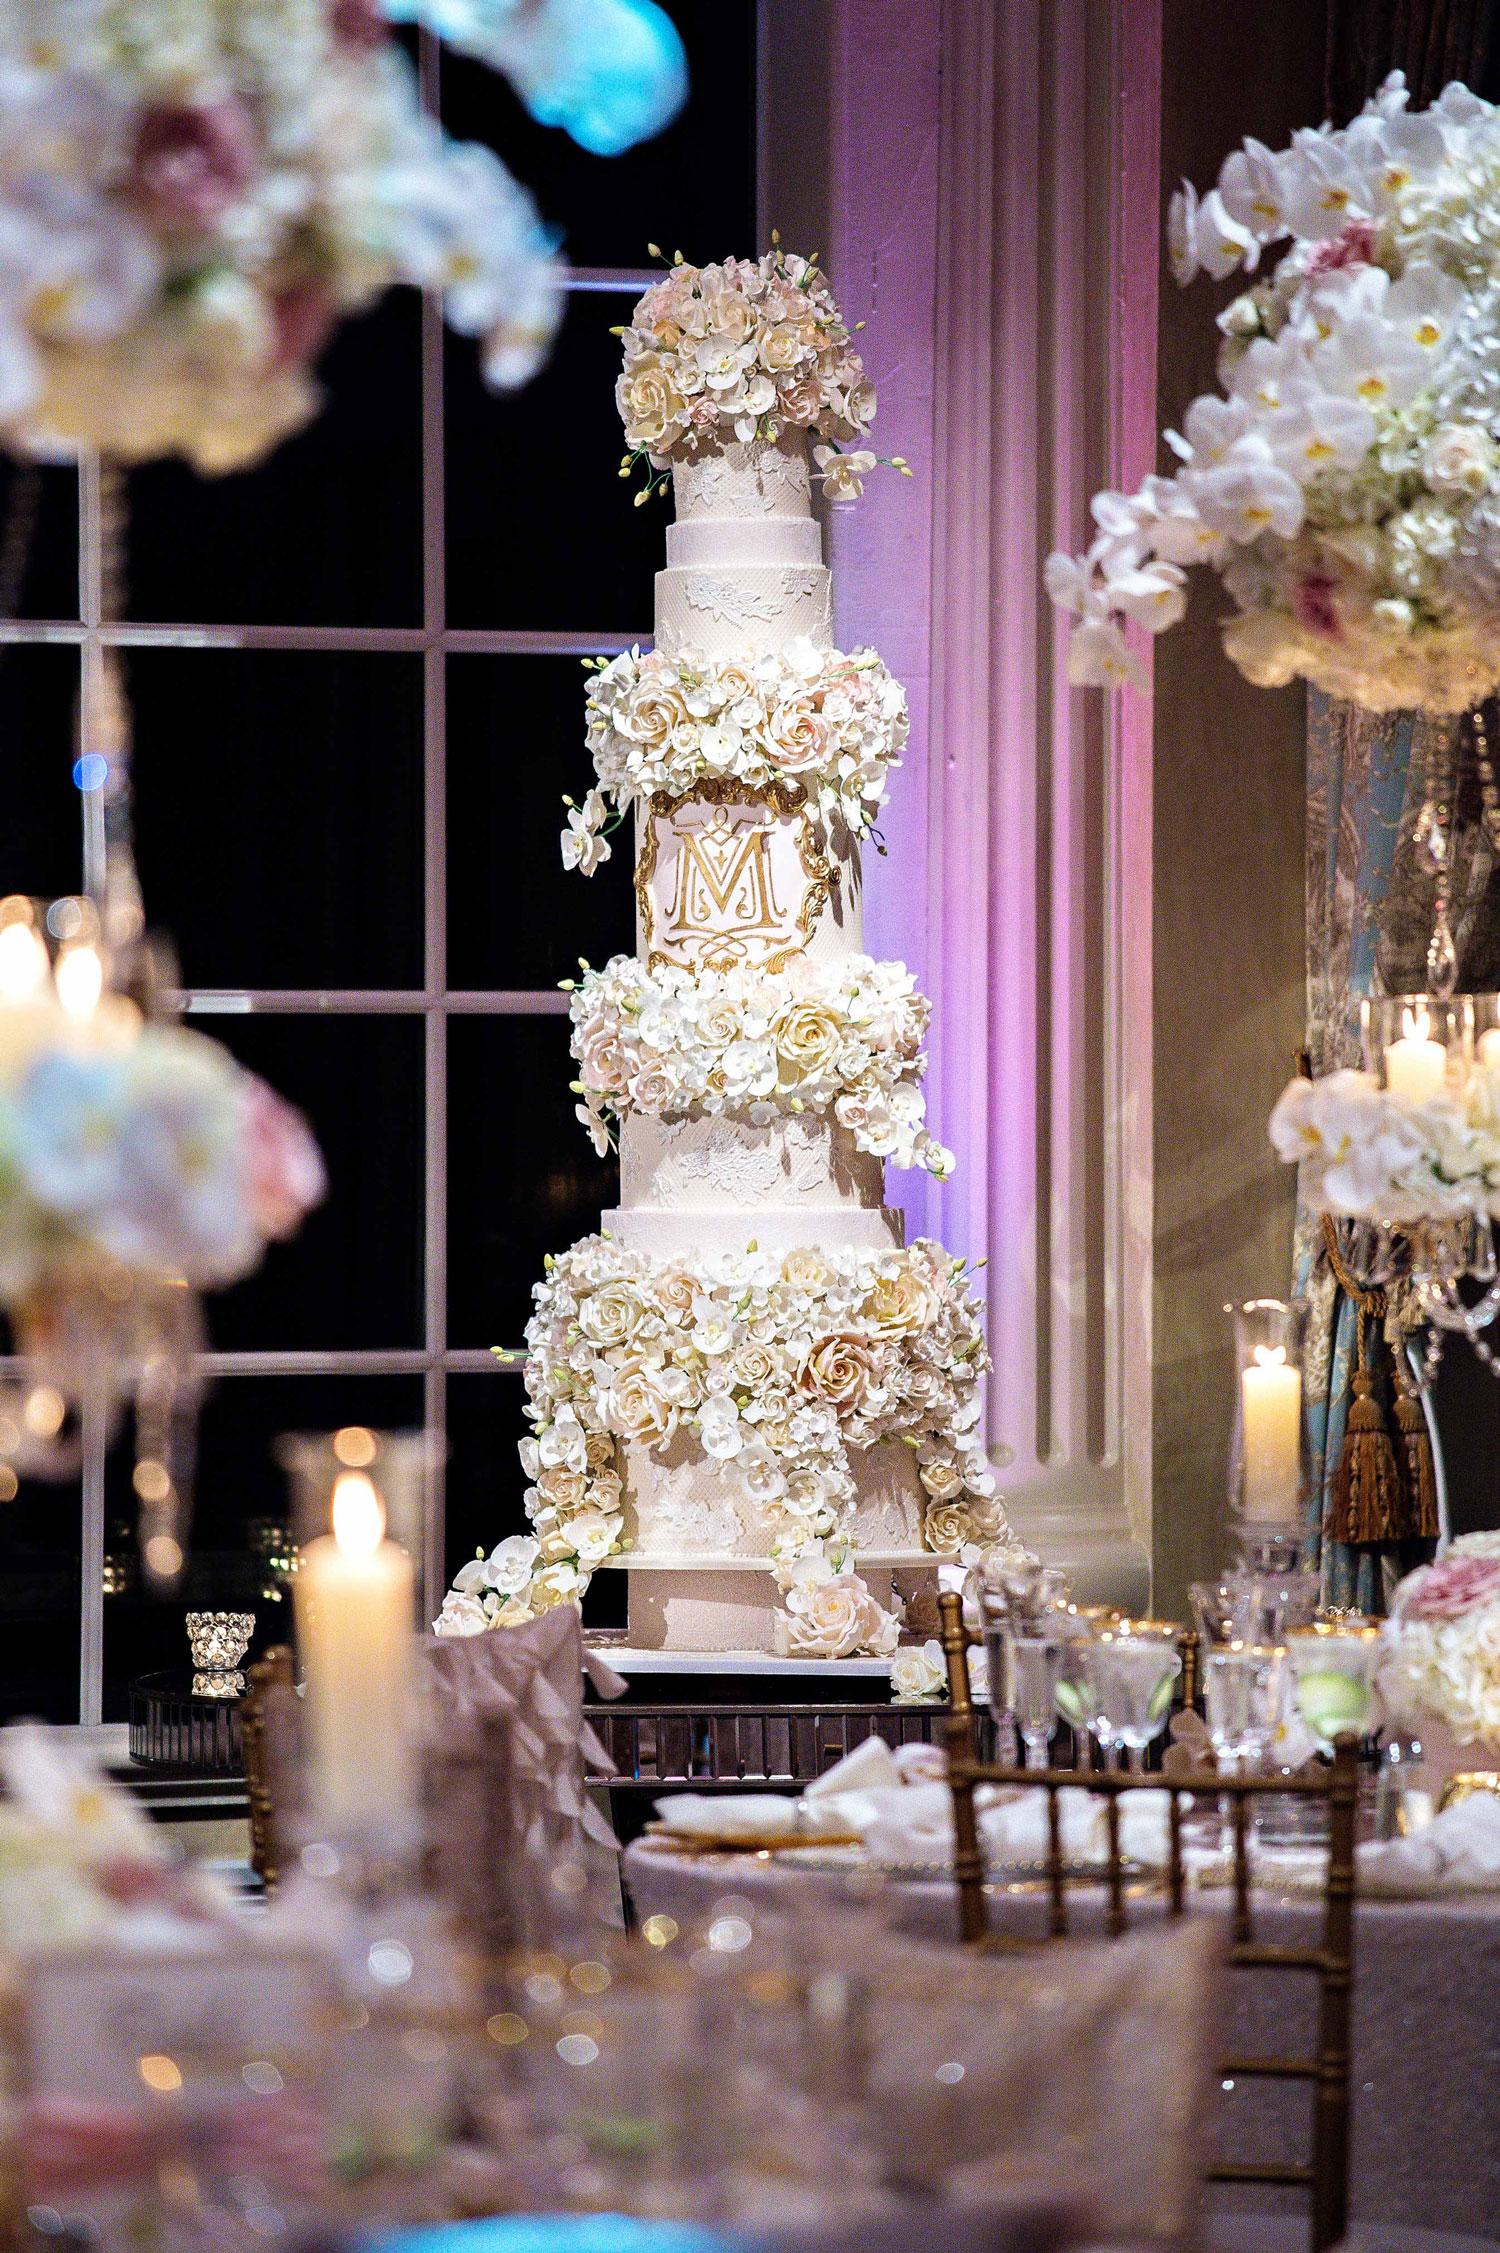 Tracy Morgan and Megan Wollover wedding cake tall opulent sugar flowers monogram